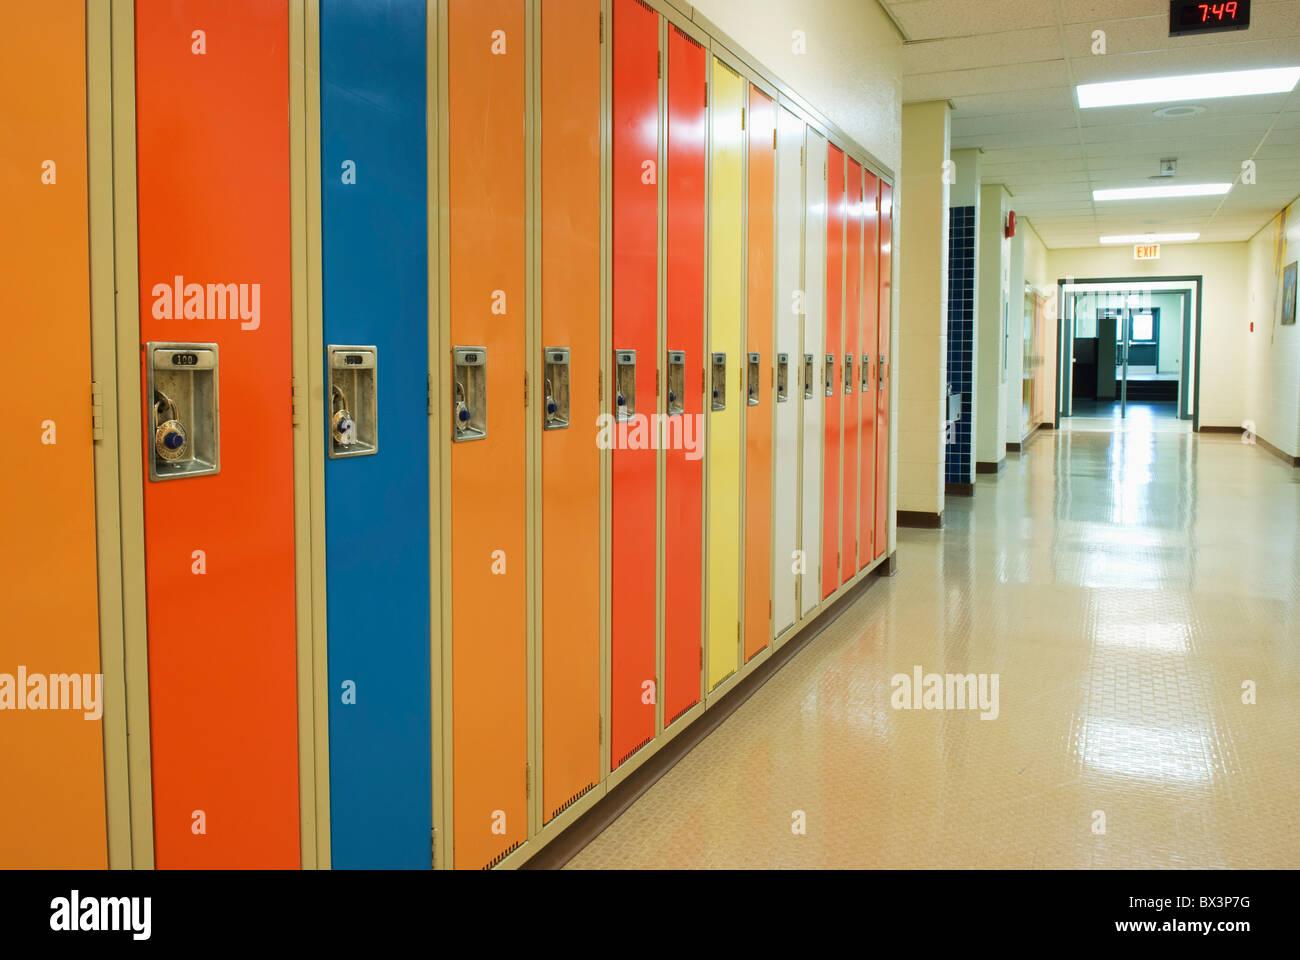 A Row Of Lockers In A School Hallway; Camrose, Alberta, Canada - Stock Image